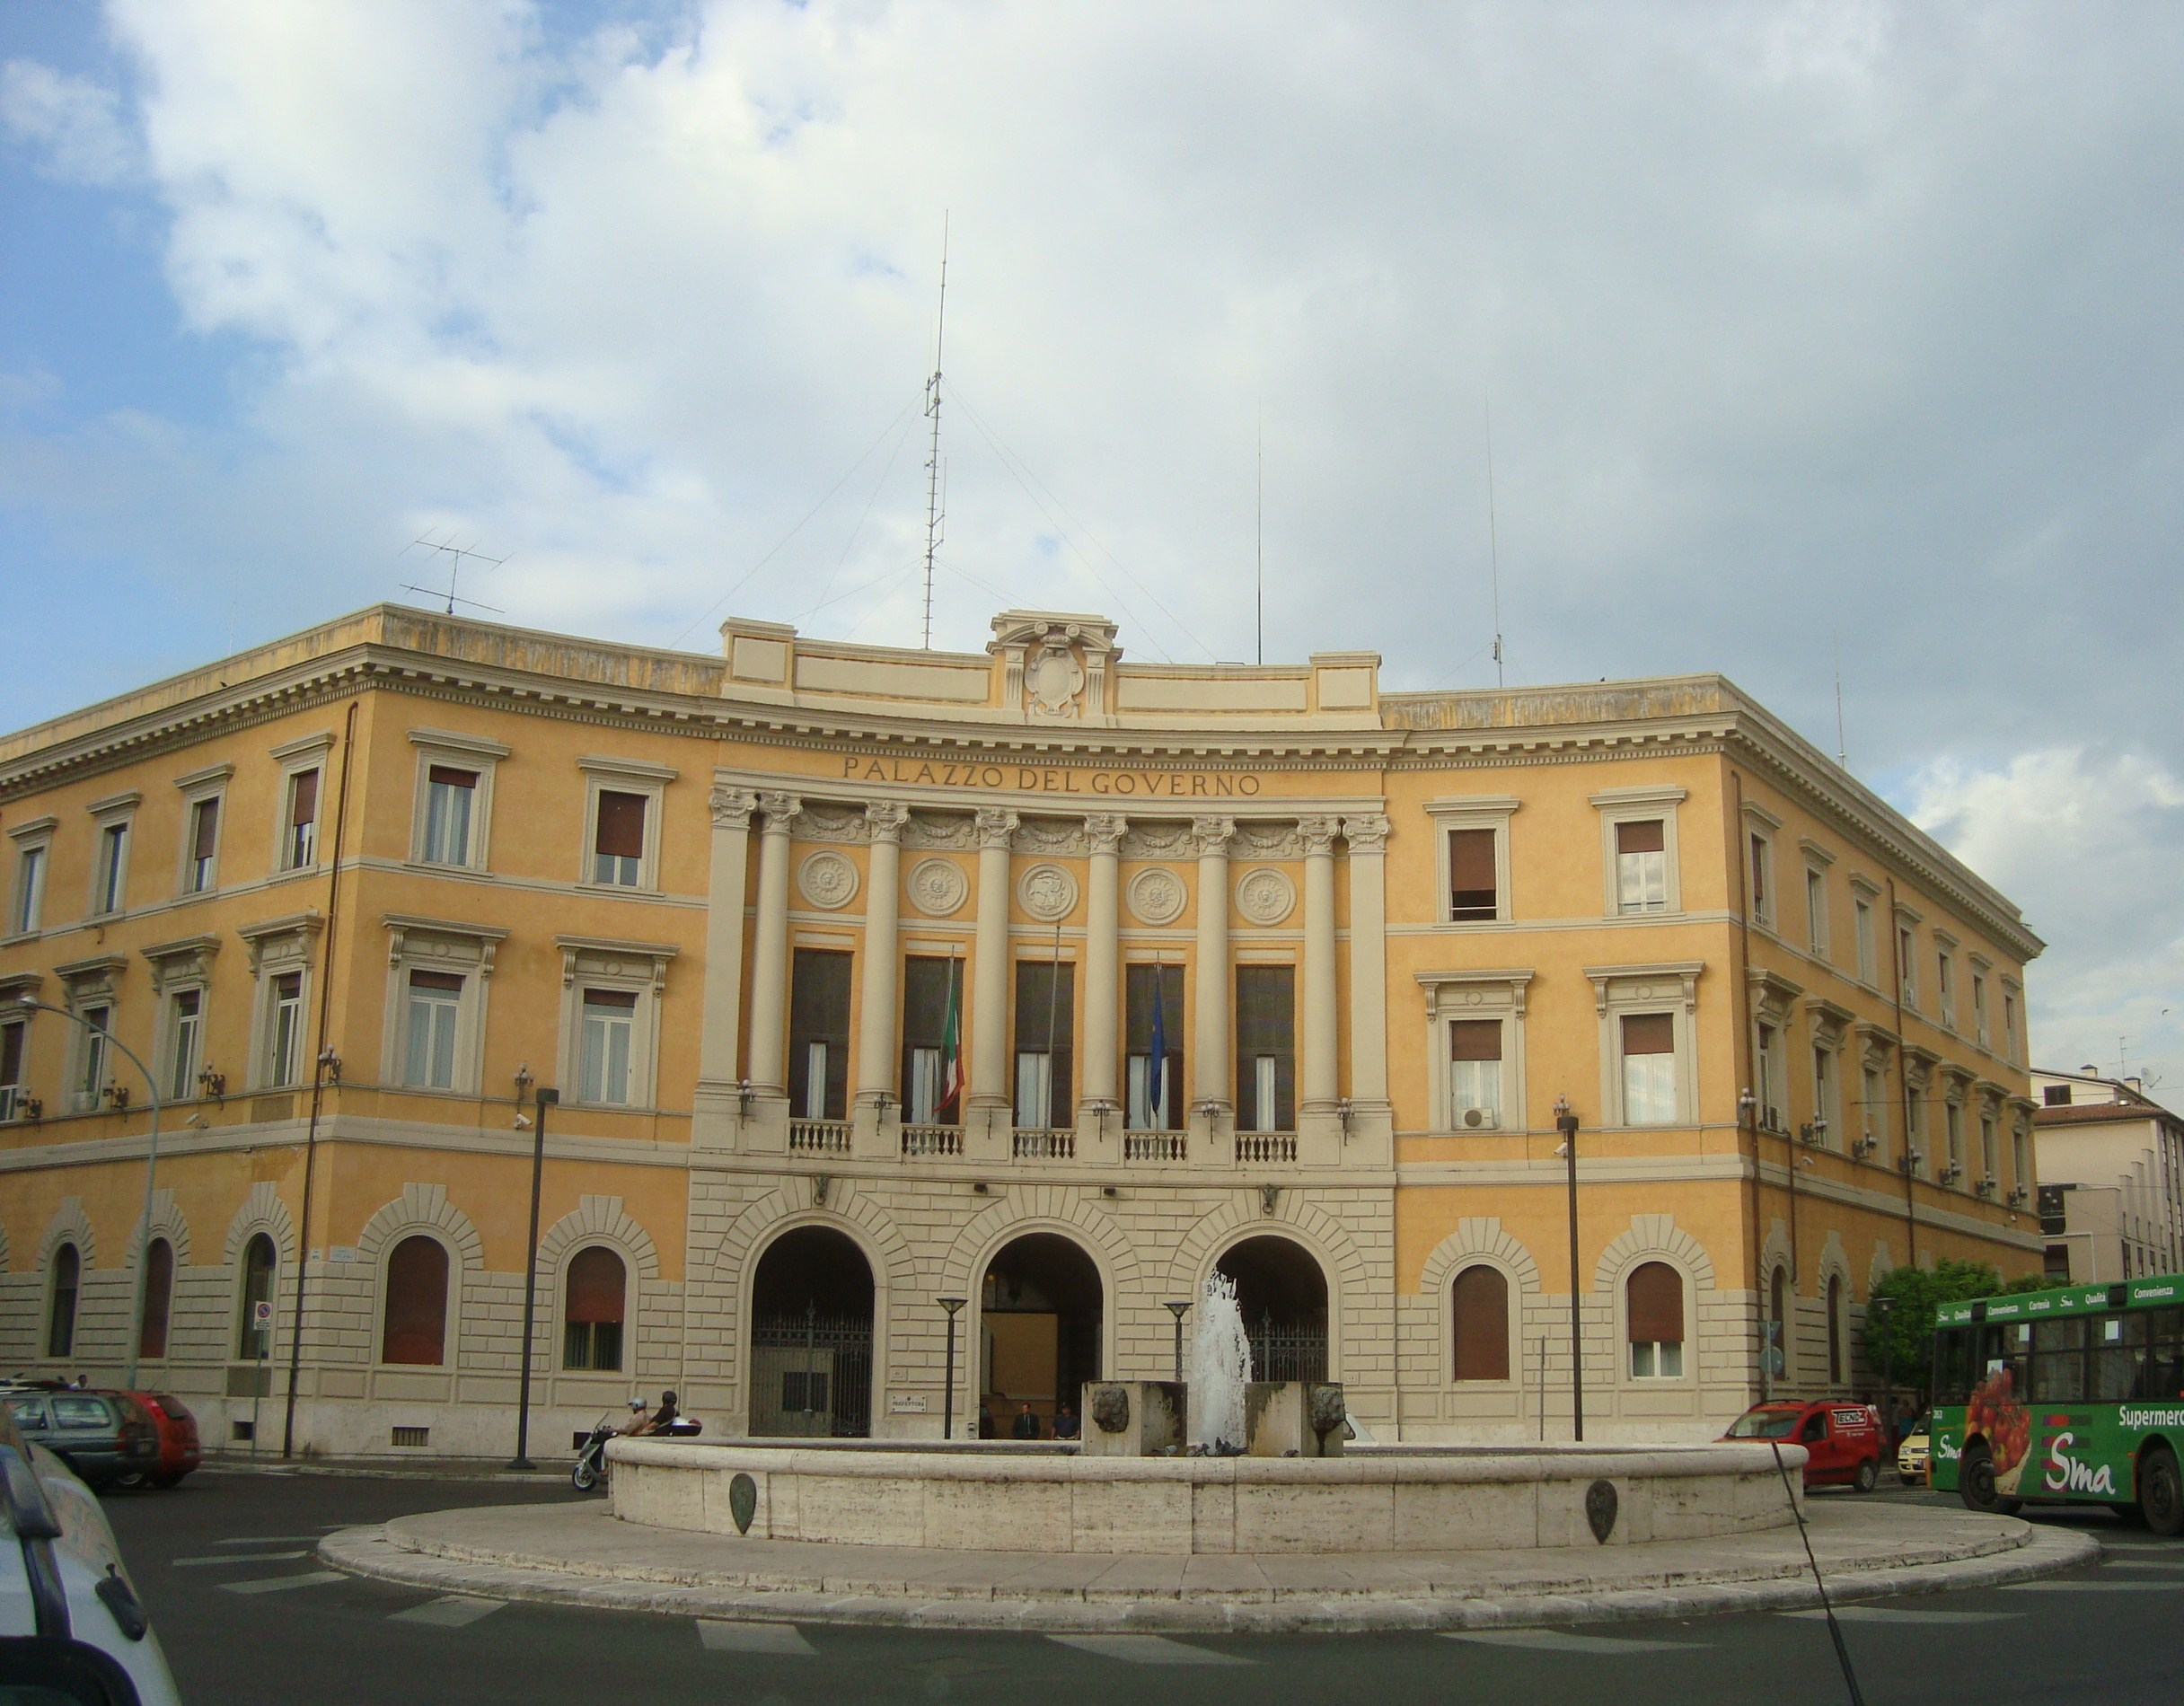 governo - photo #15